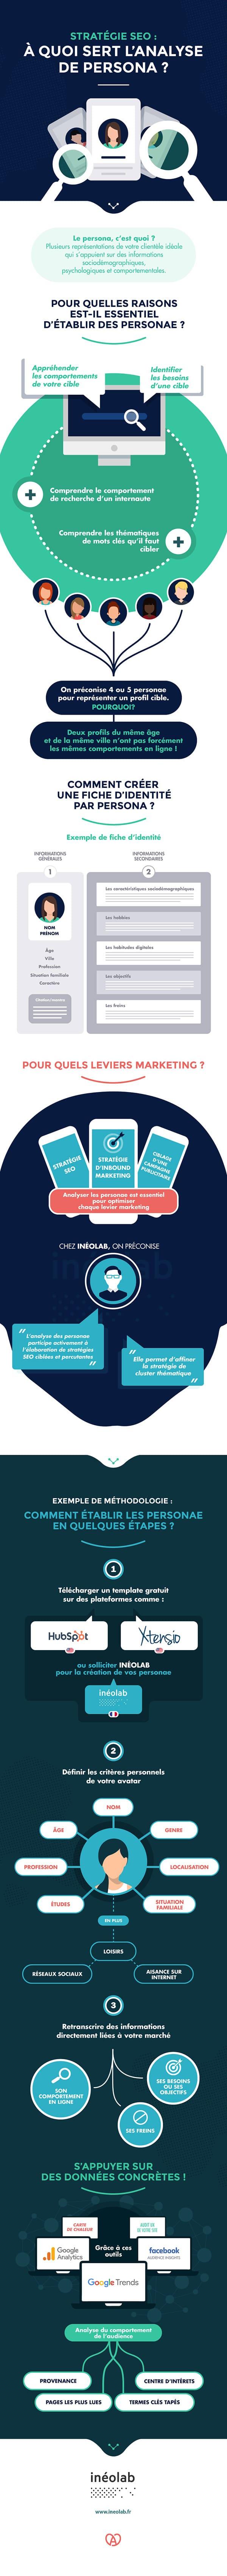 Analyse persona et stratégie SEO infographie BD